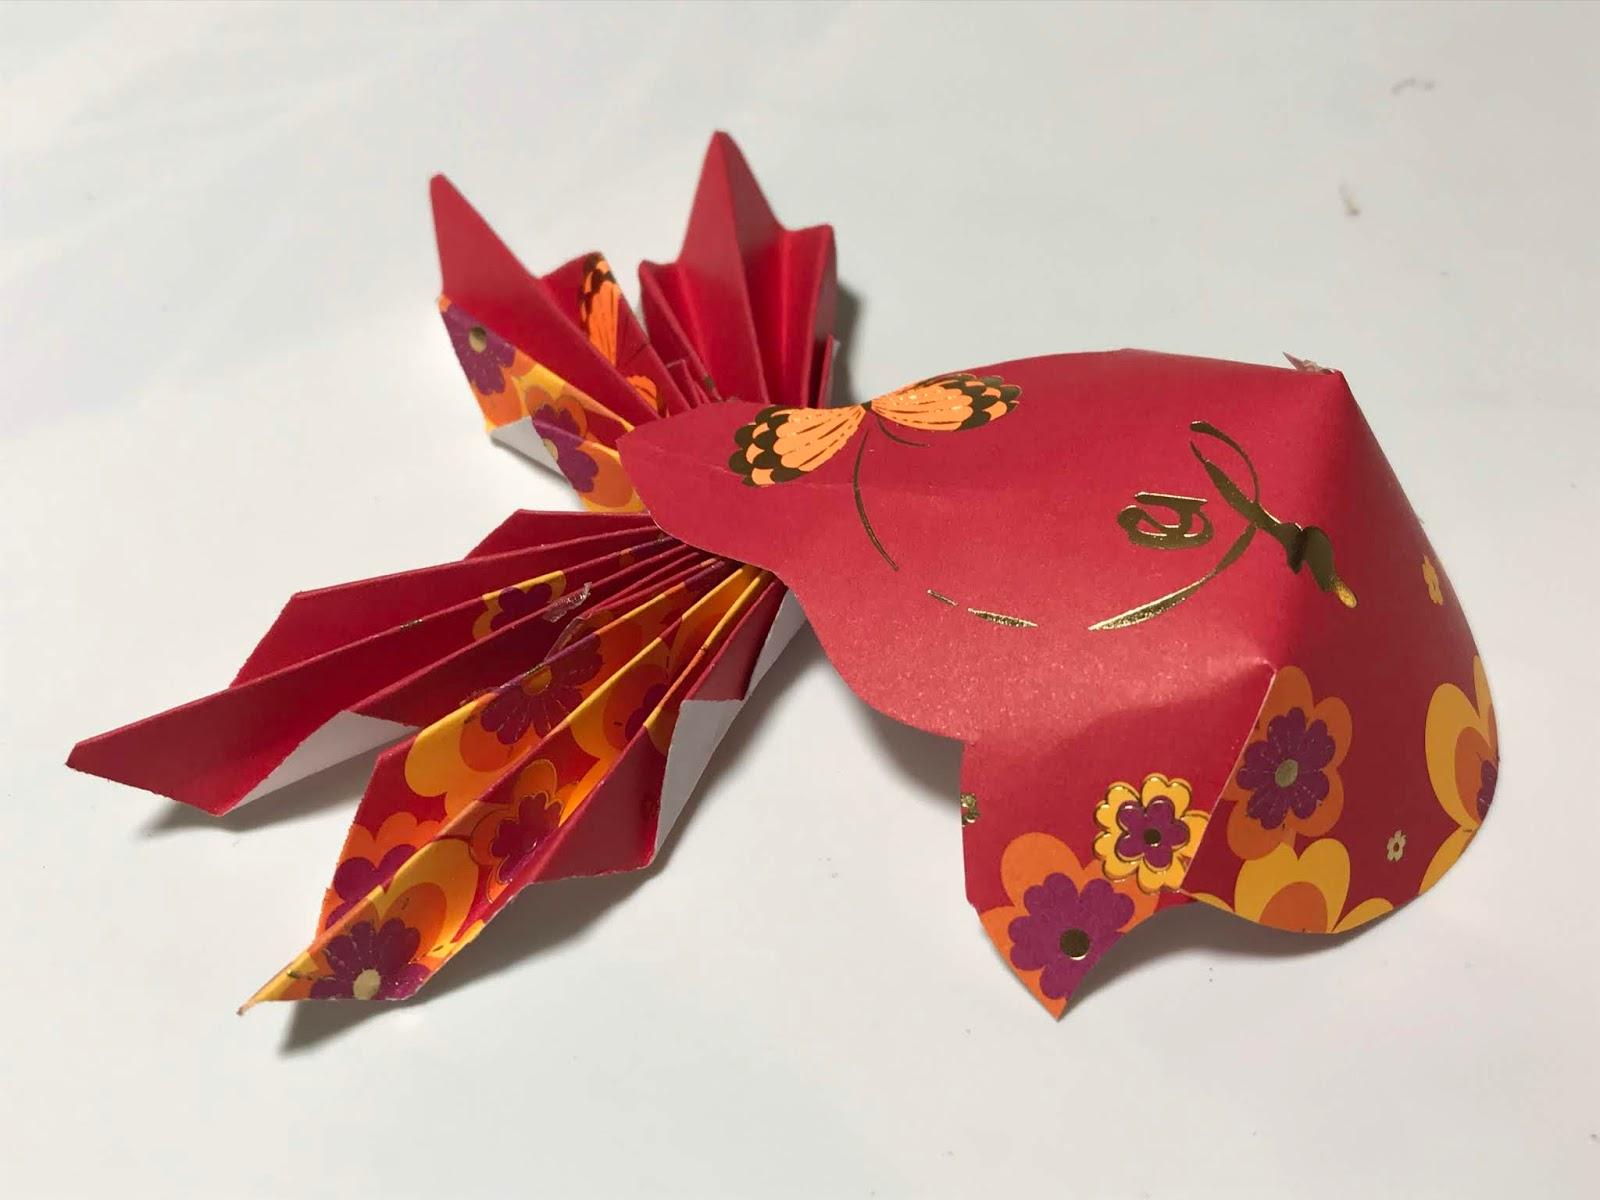 Tutorial: How to make an Origami koi Fish - YouTube | 1200x1600